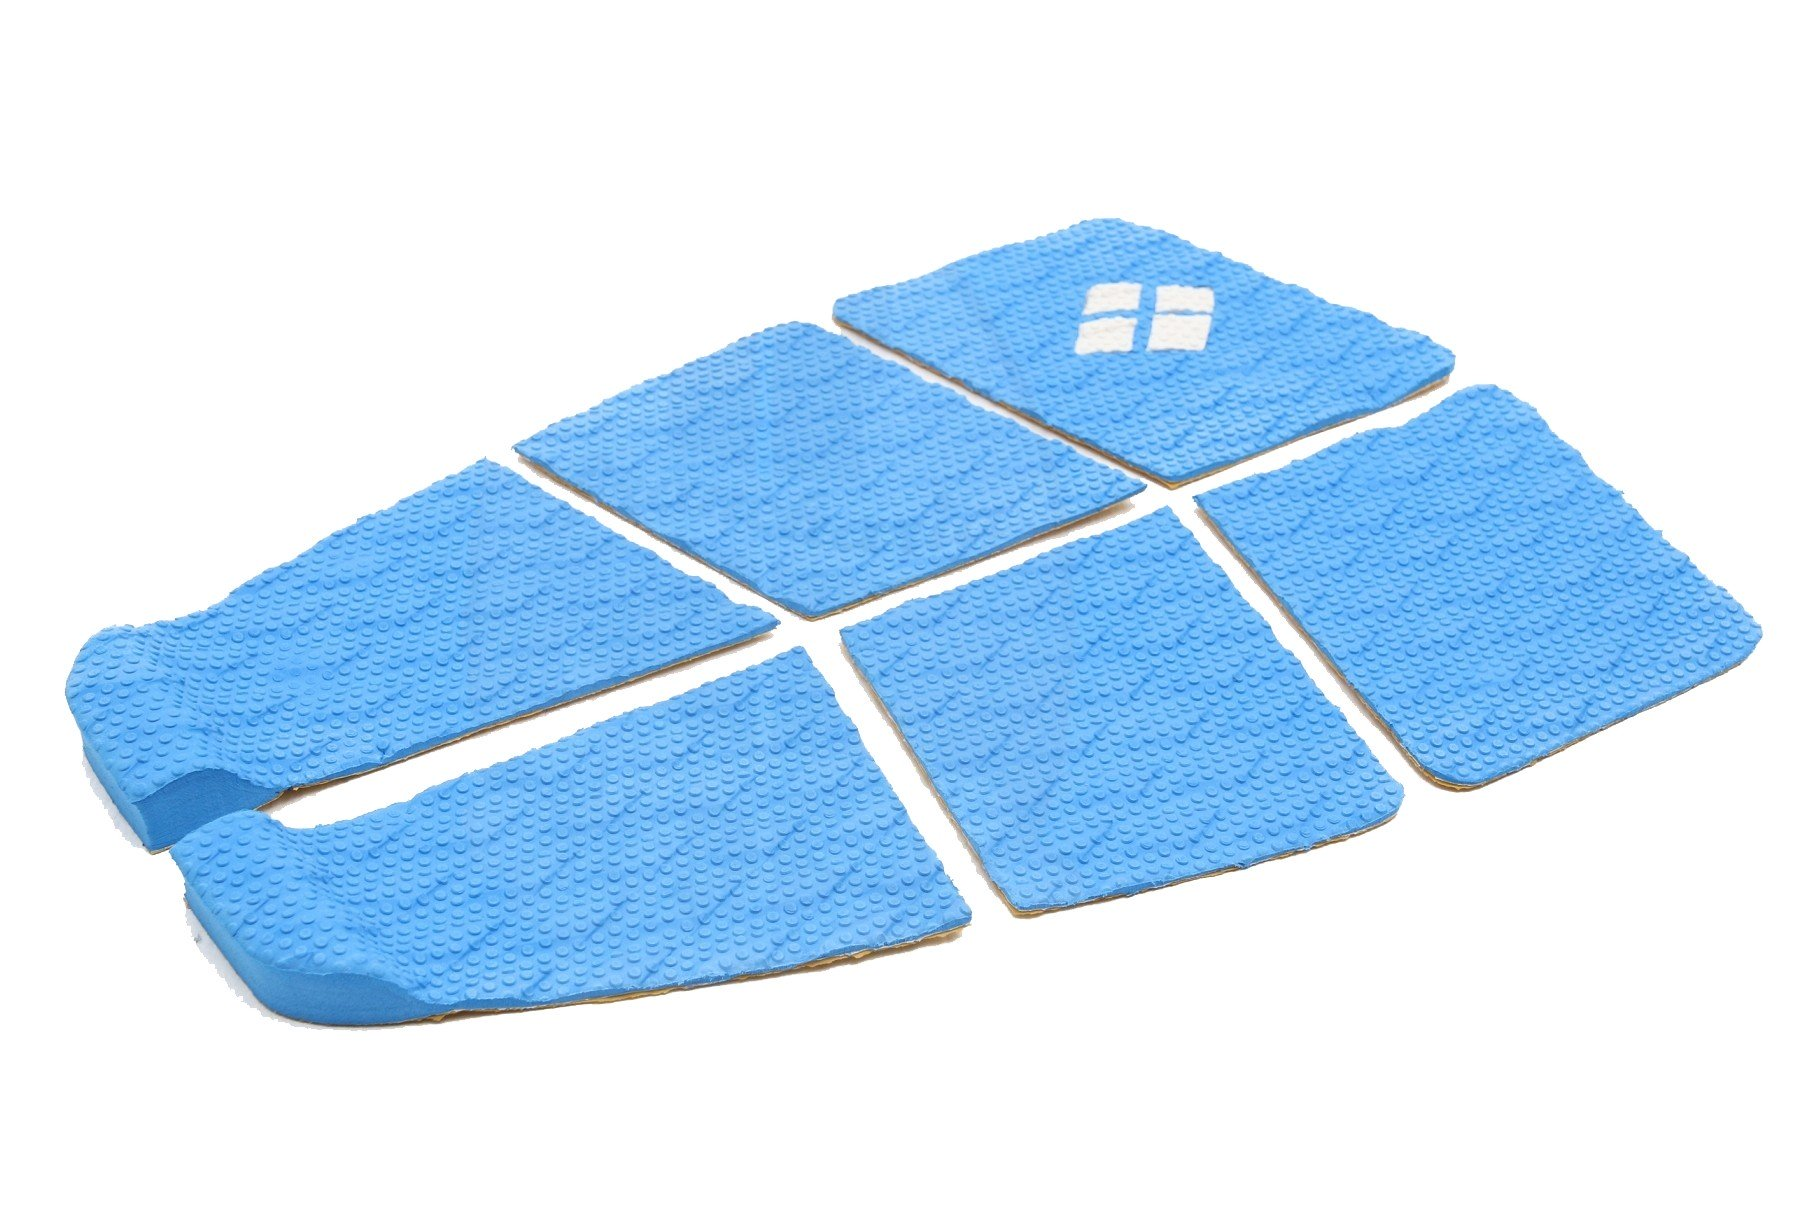 Deck Surf 6 Partes Rubber Stickay Azul | Prancharia